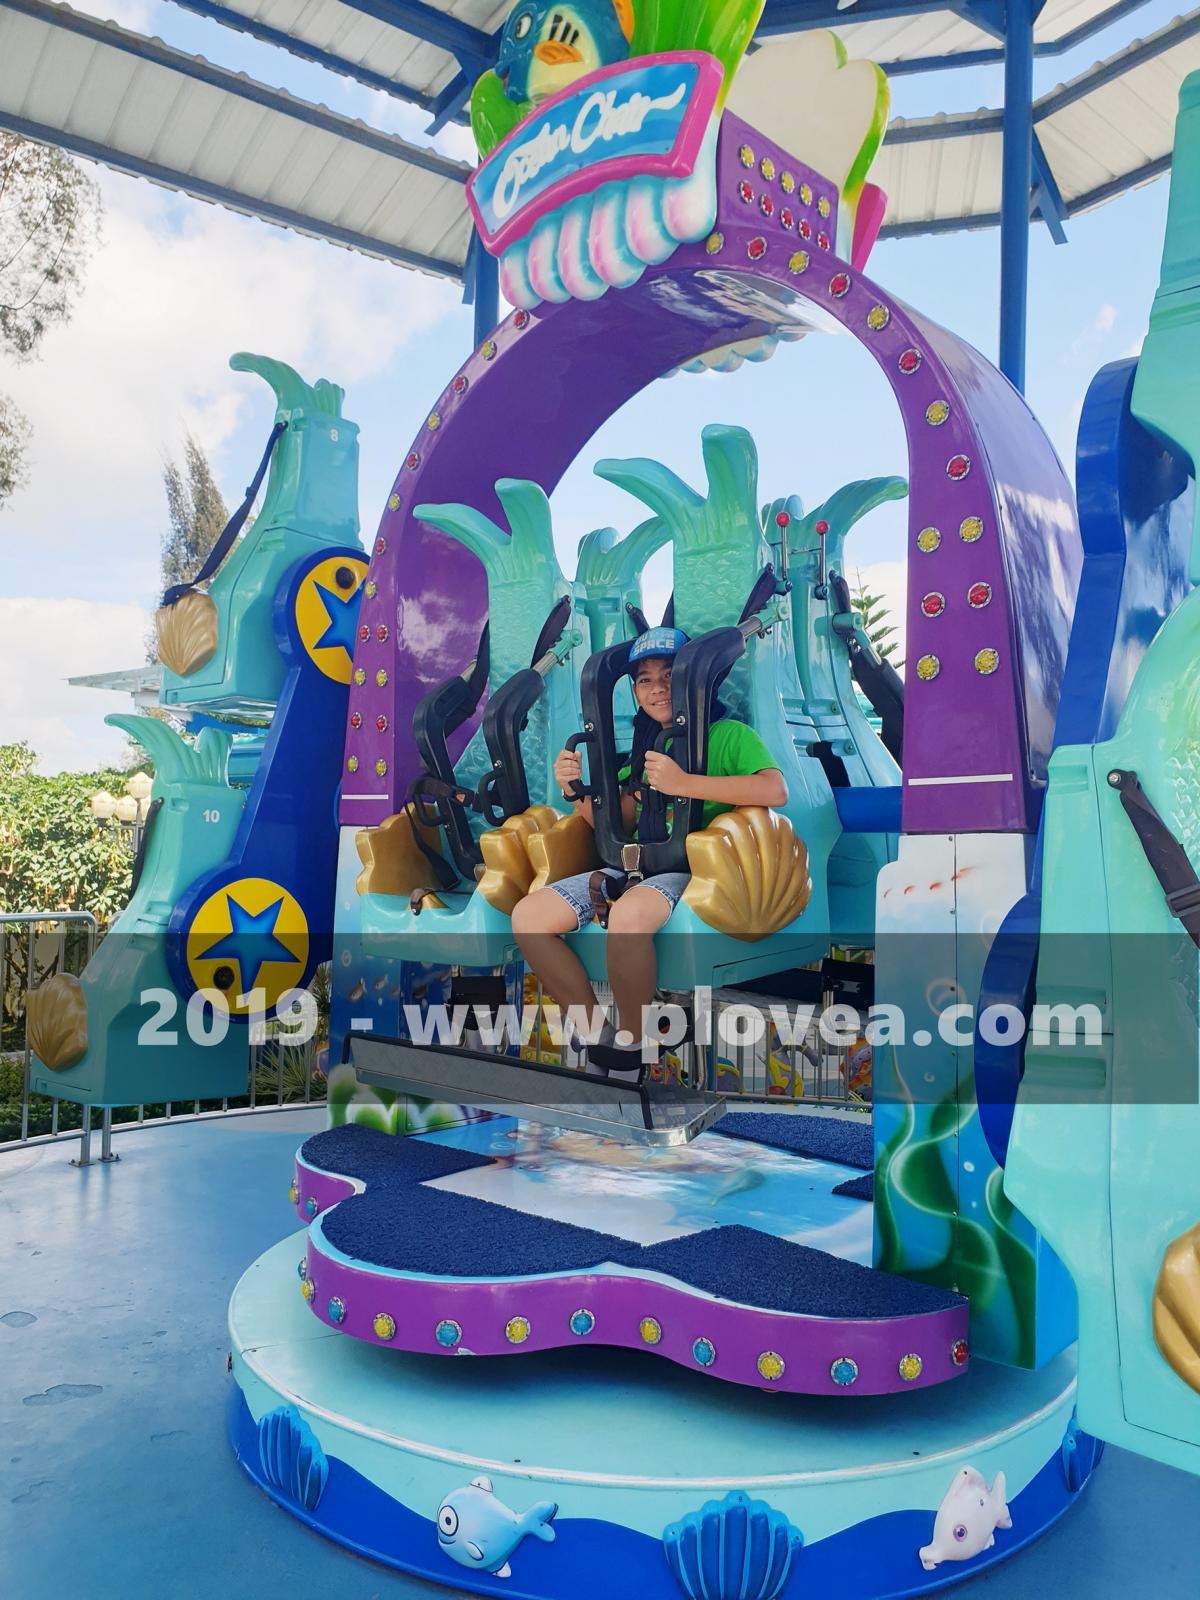 Berastagi Mikie Holiday Resort Dan Uji Nyali Di Mikie Holiday Funland When Samosir Meets Krones